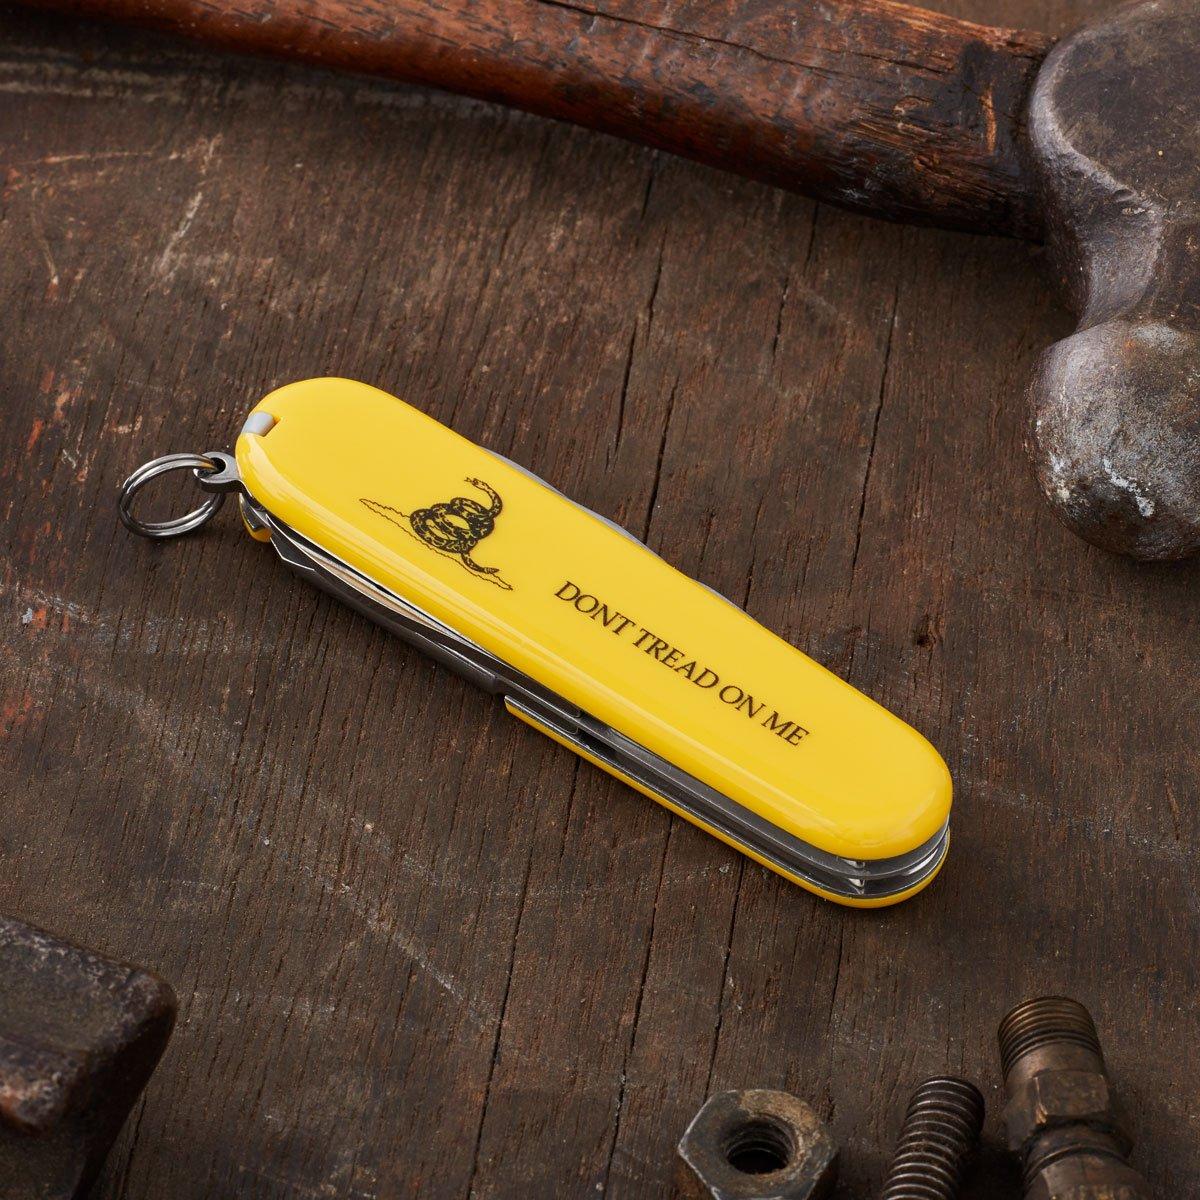 Victorinox Swiss Army Tinker Pocket Knife Instant Pot